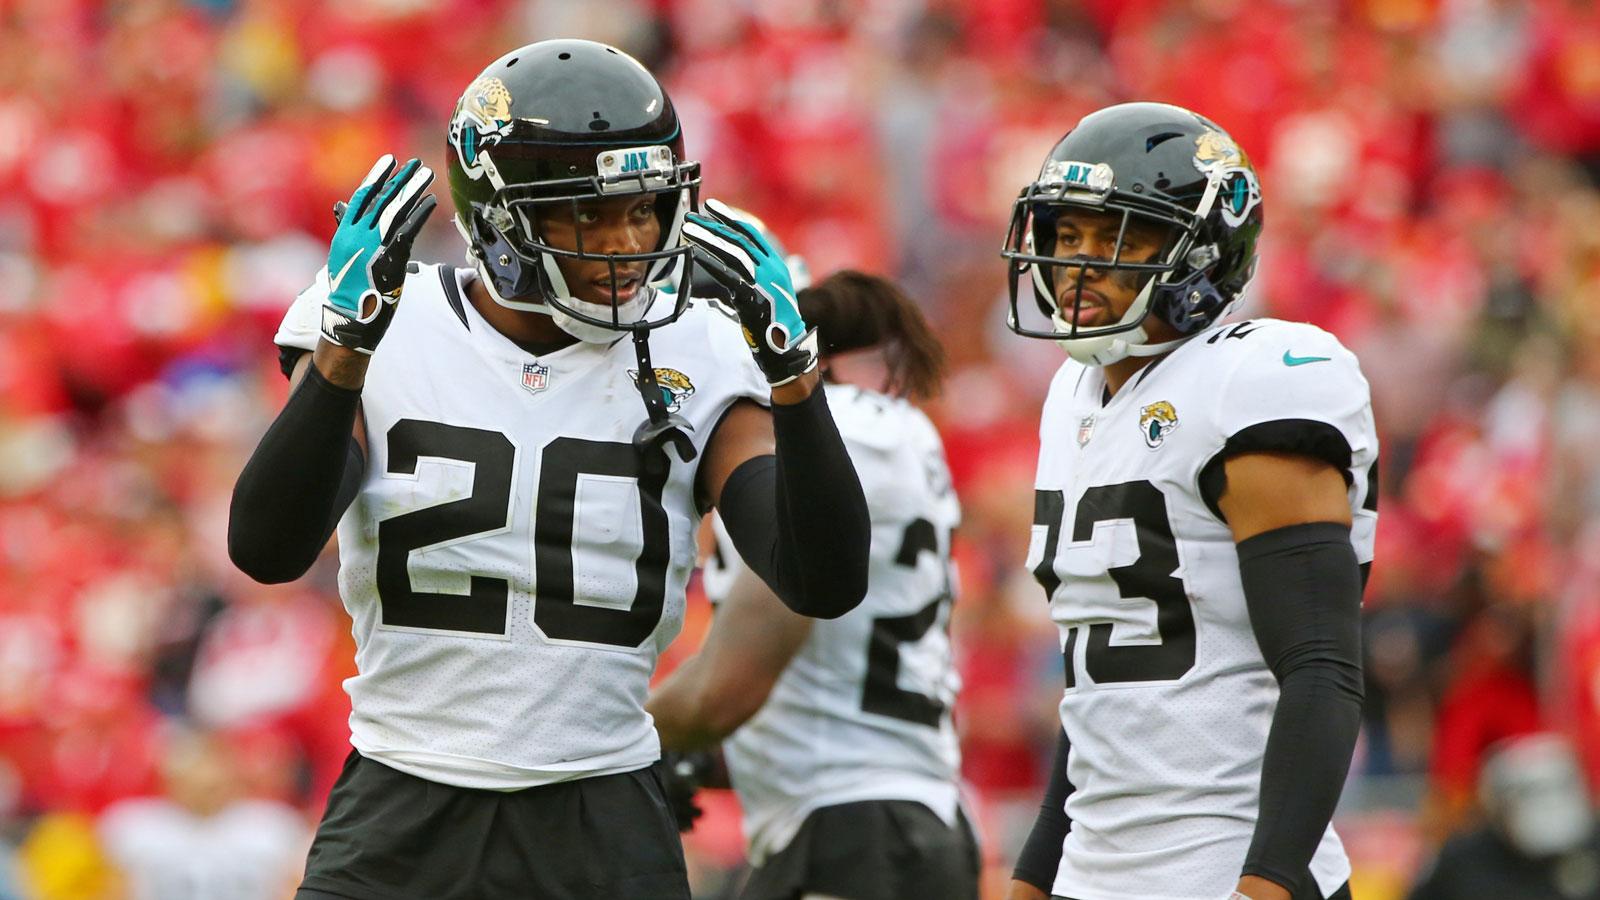 Jaguars' Jalen Ramsey brushes off Patriots CB Stephon Gilmore's criticism